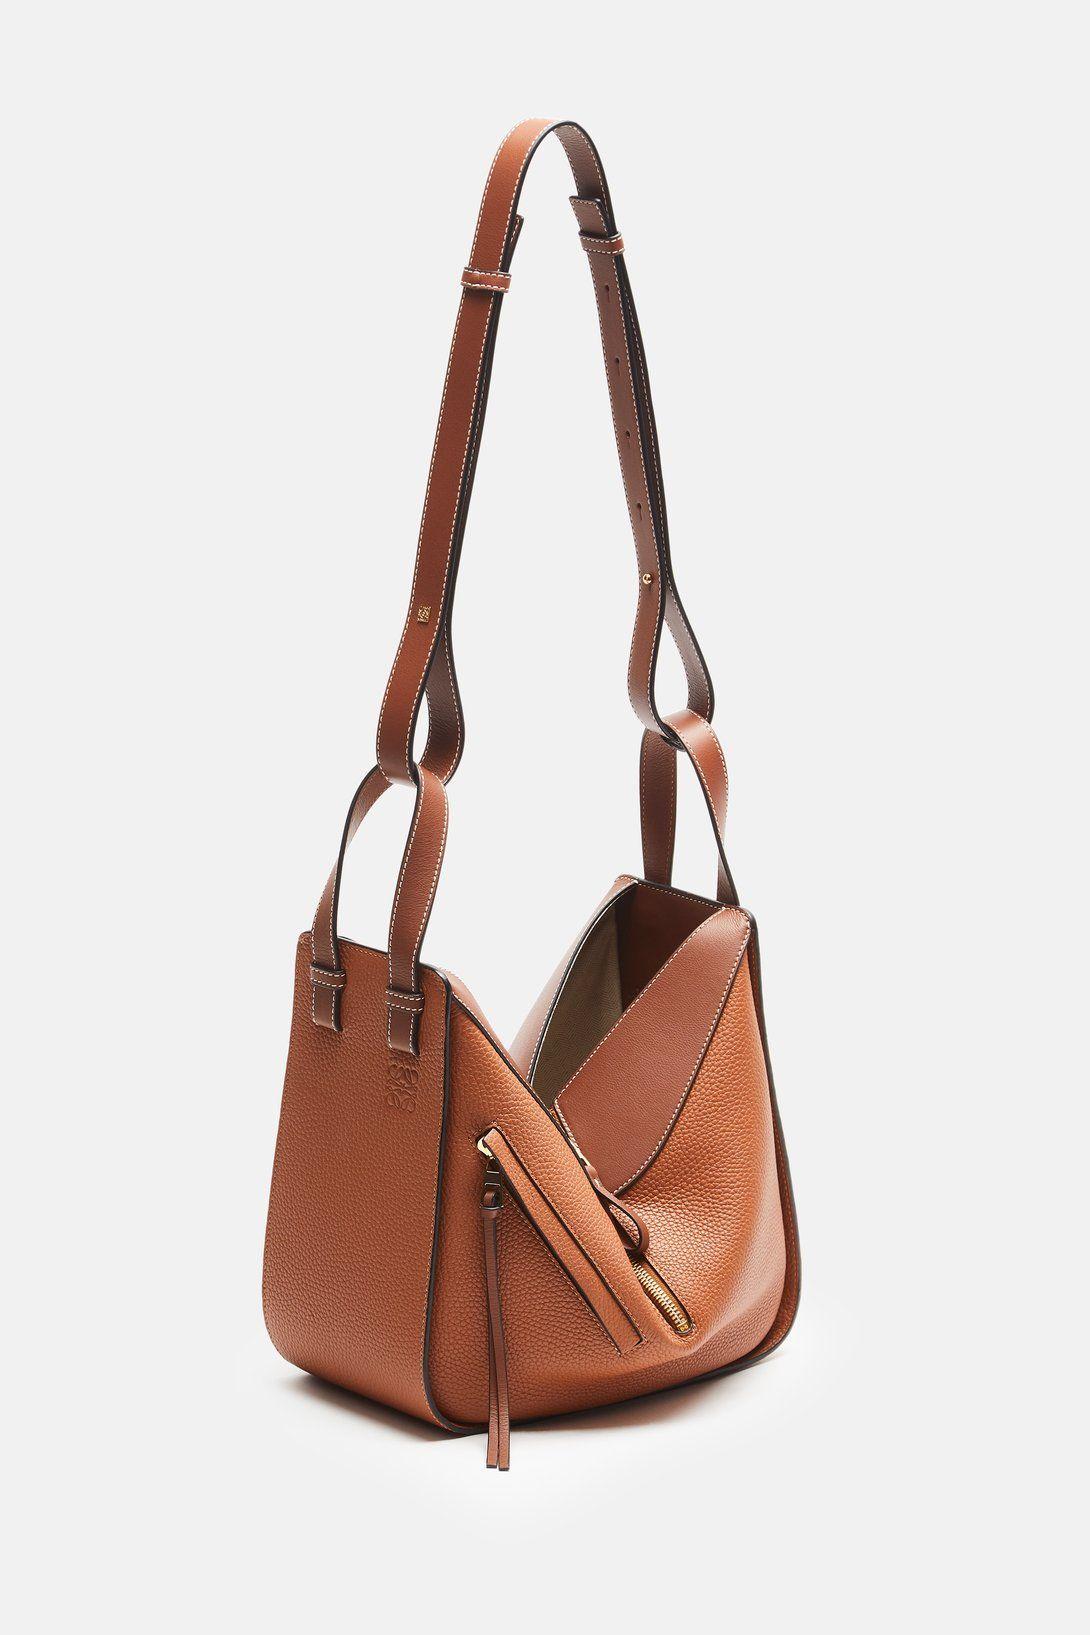 0baf0912fe Loewe Hammock Small Bag - Tan